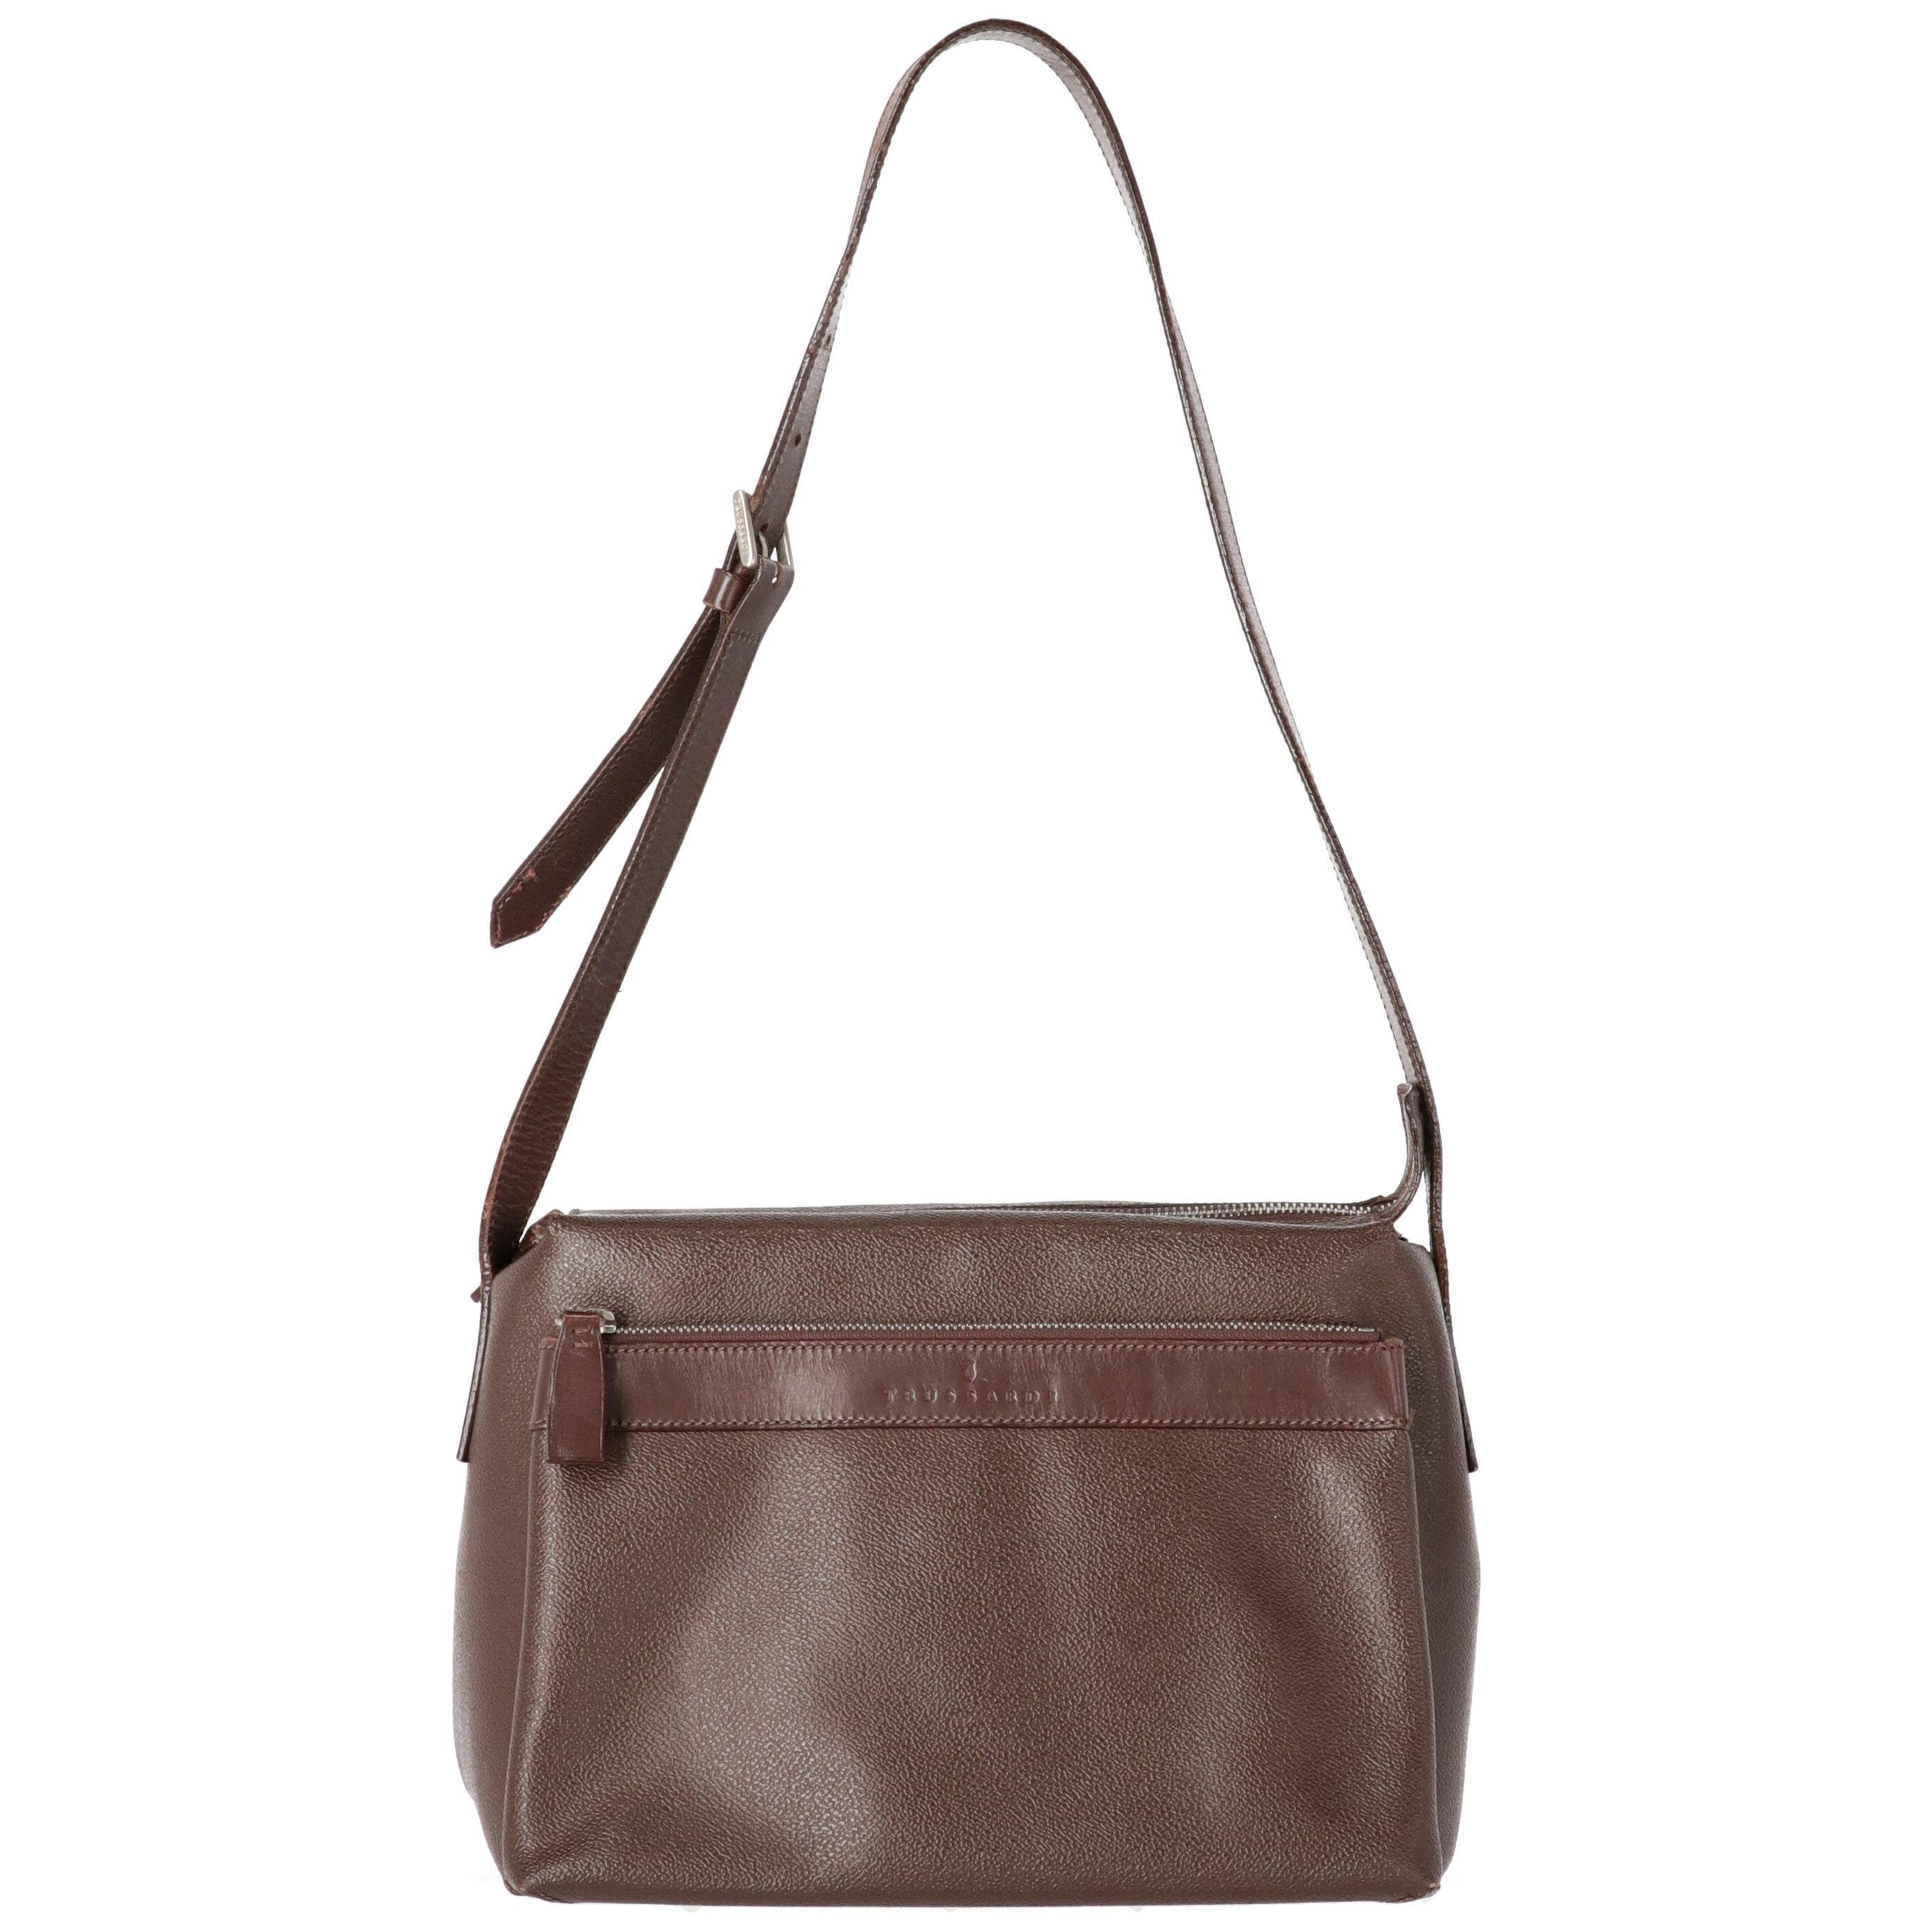 1990s Trussardi Brown Laeather Shoulder Bag